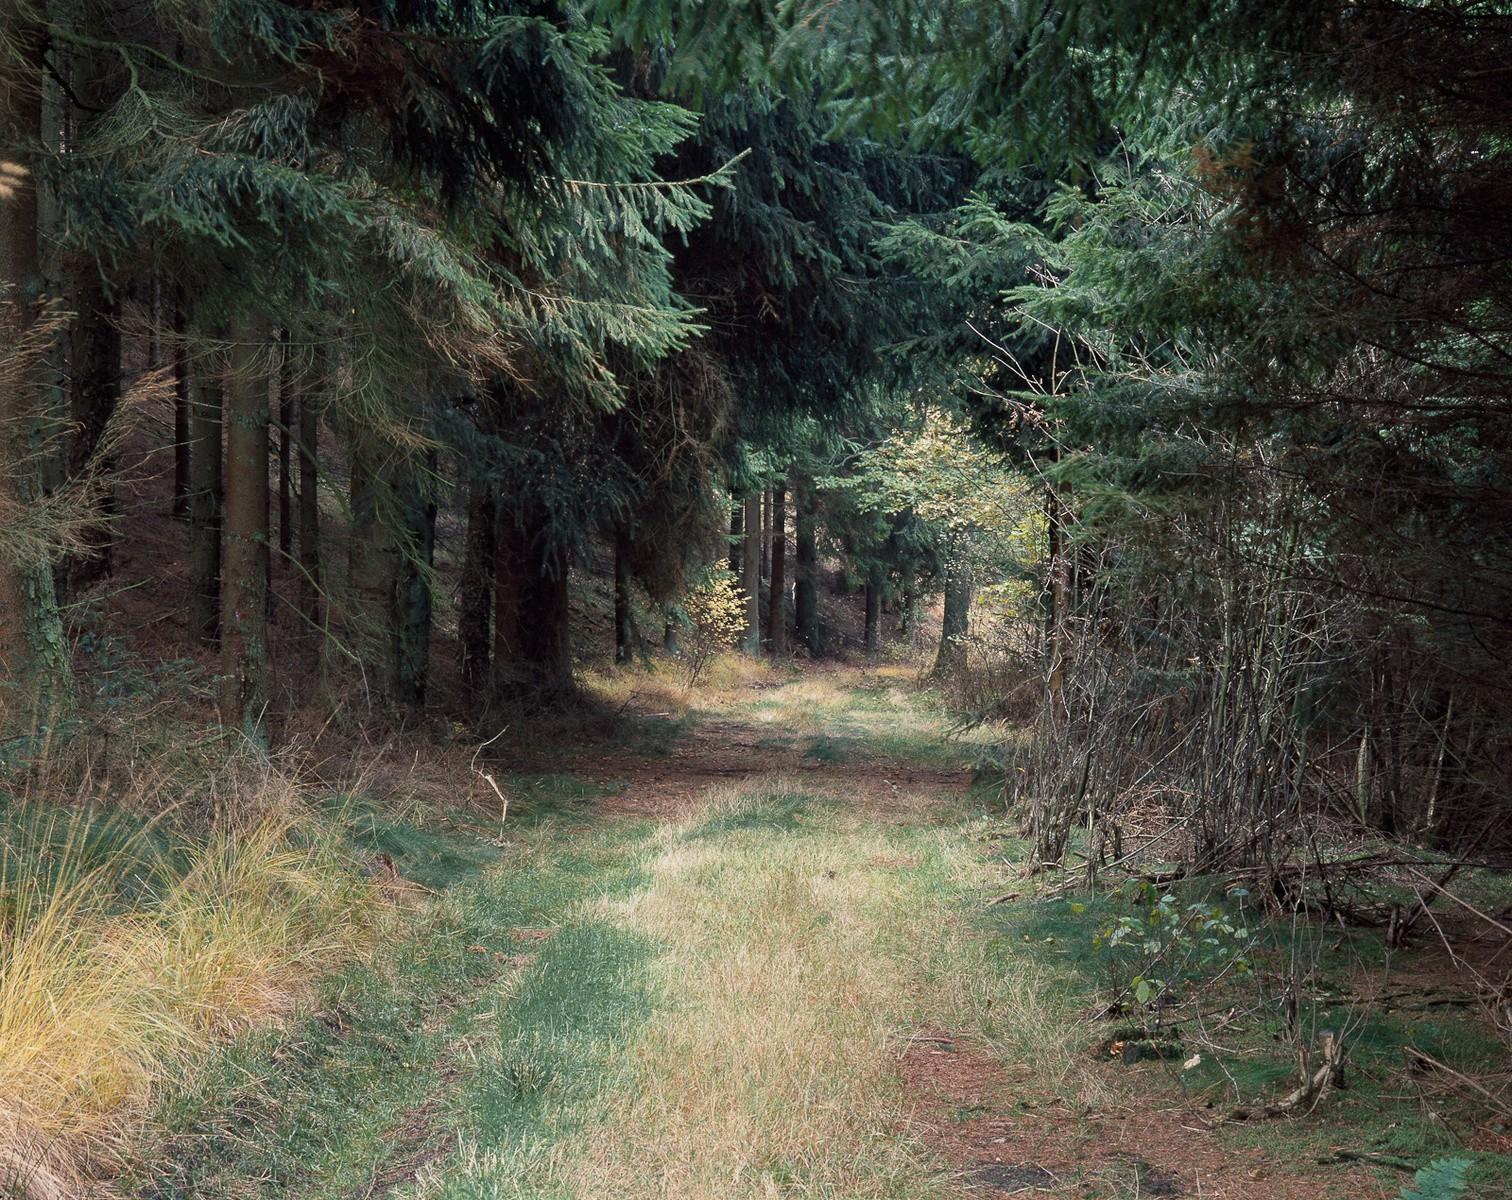 torben eskerod - beyond the rush 3